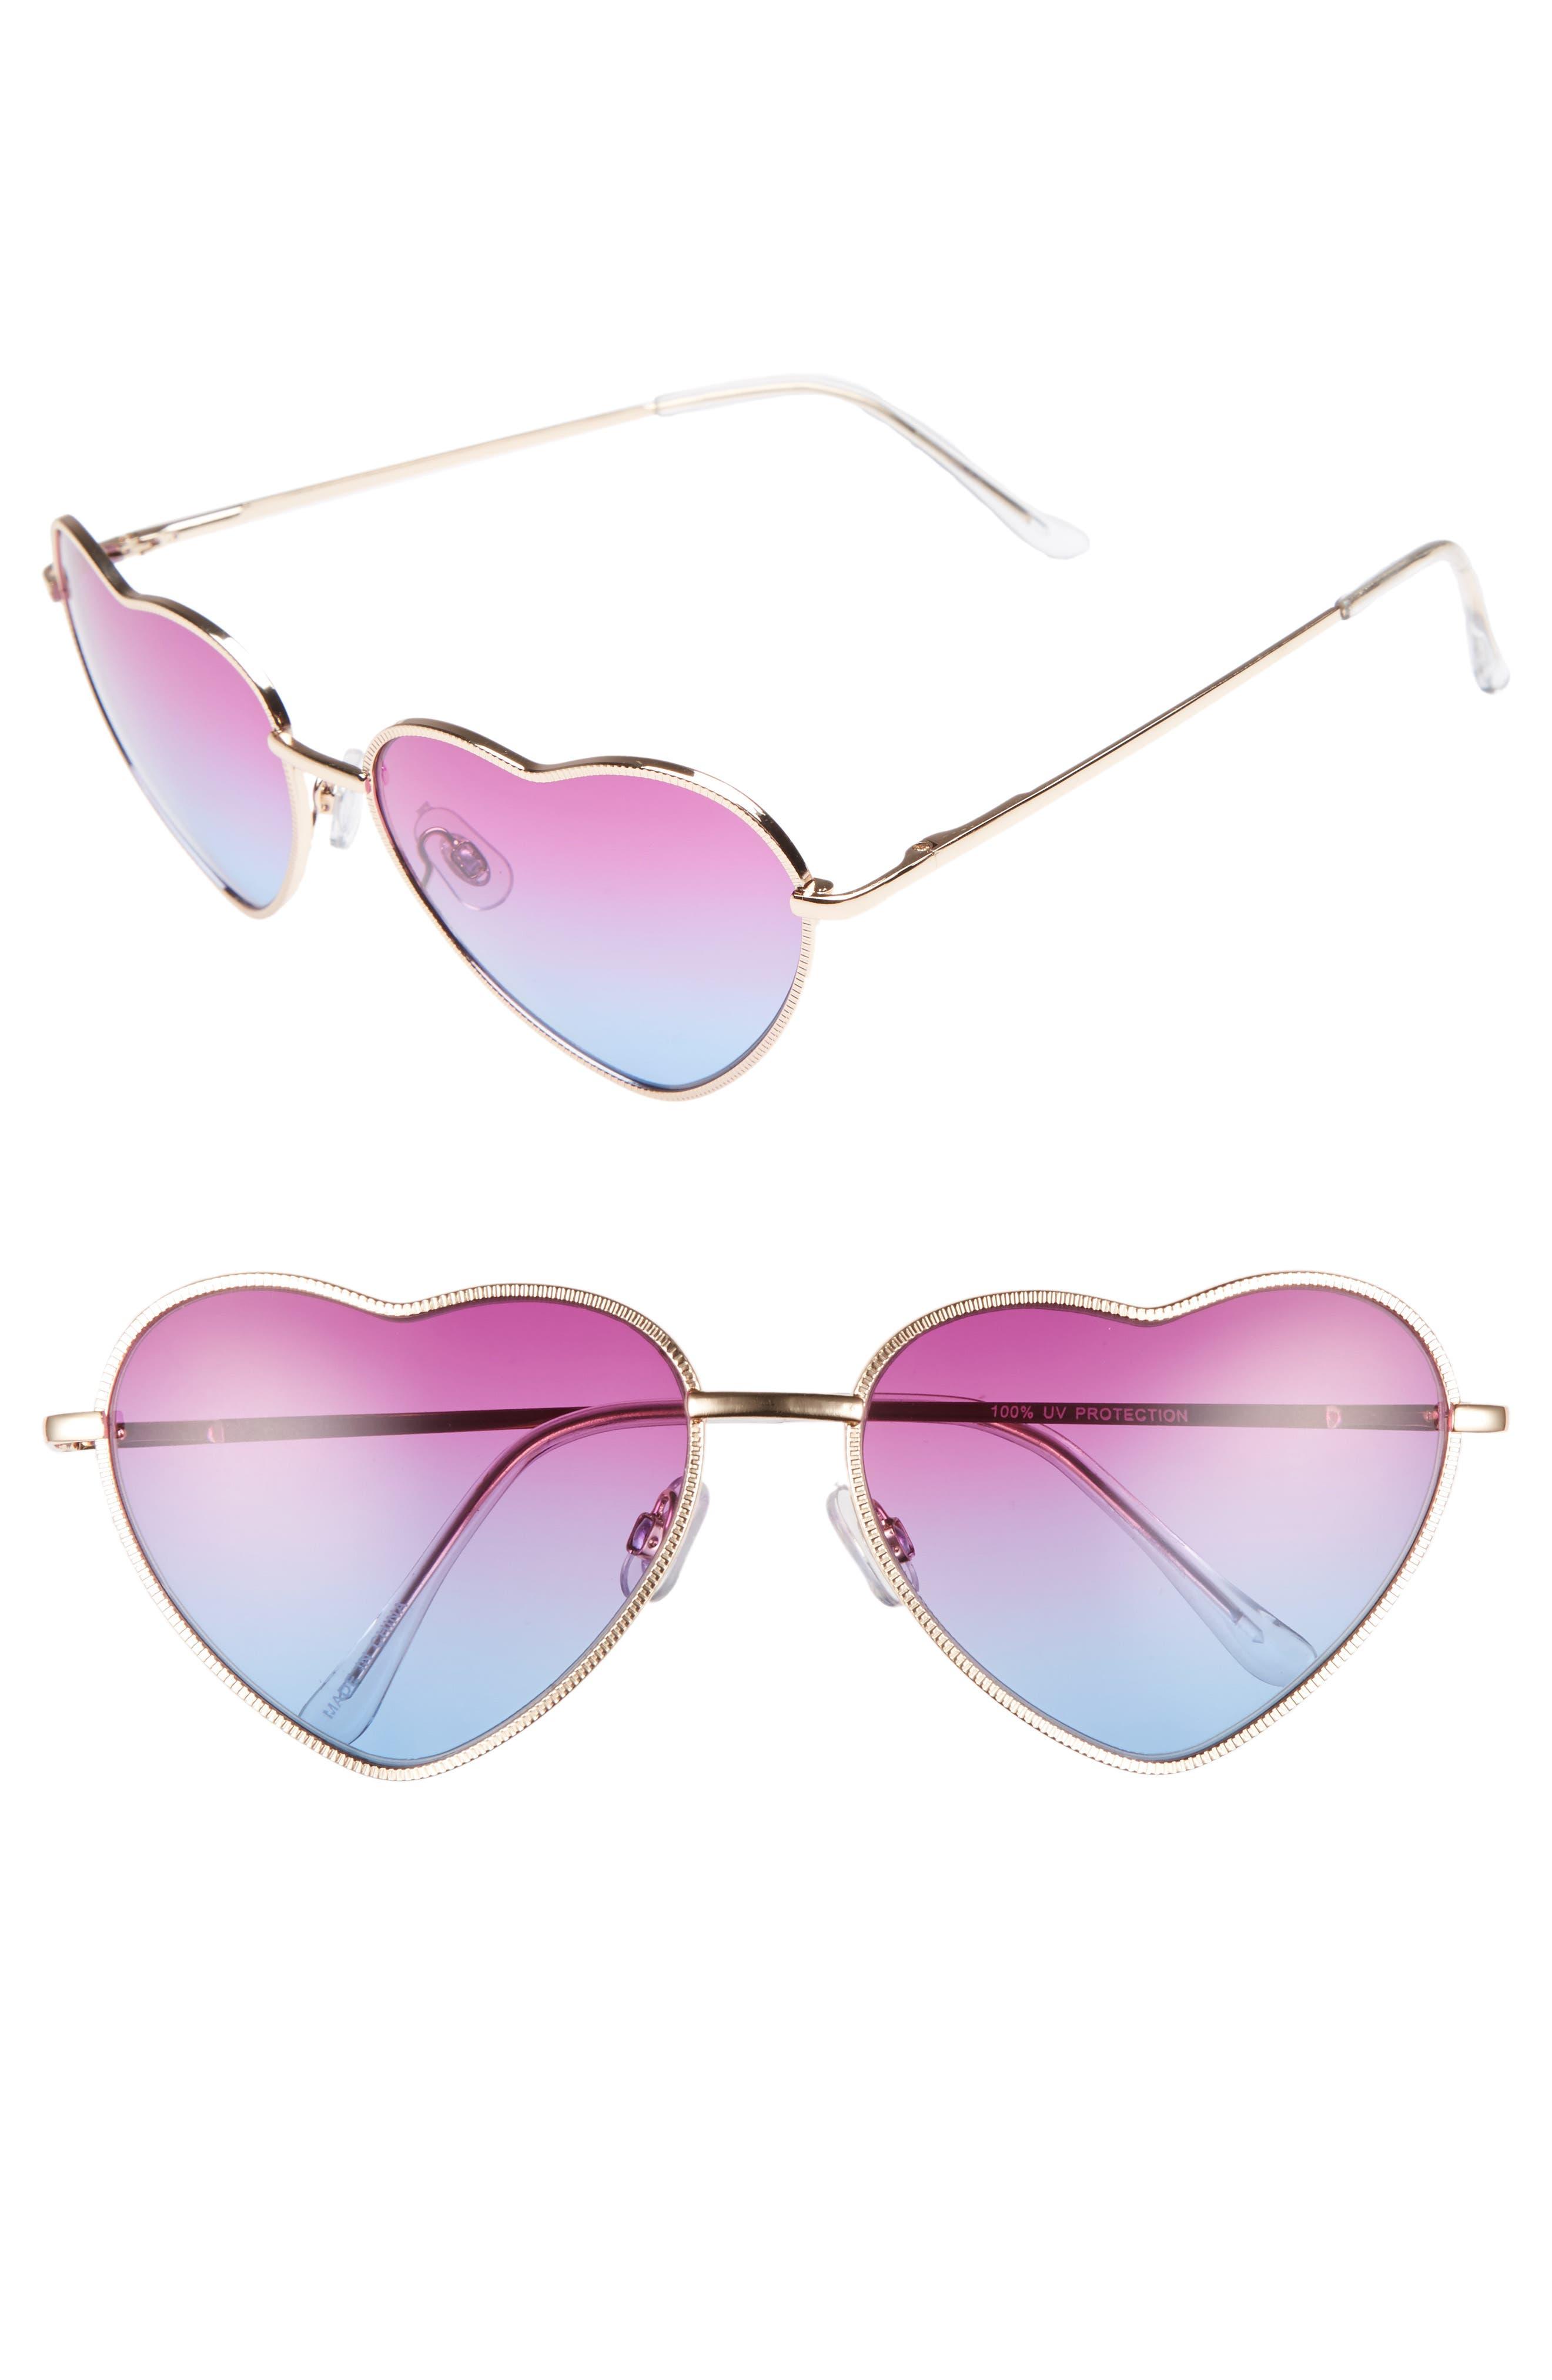 Main Image - BP. Heart Shaped 58mm Sunglasses